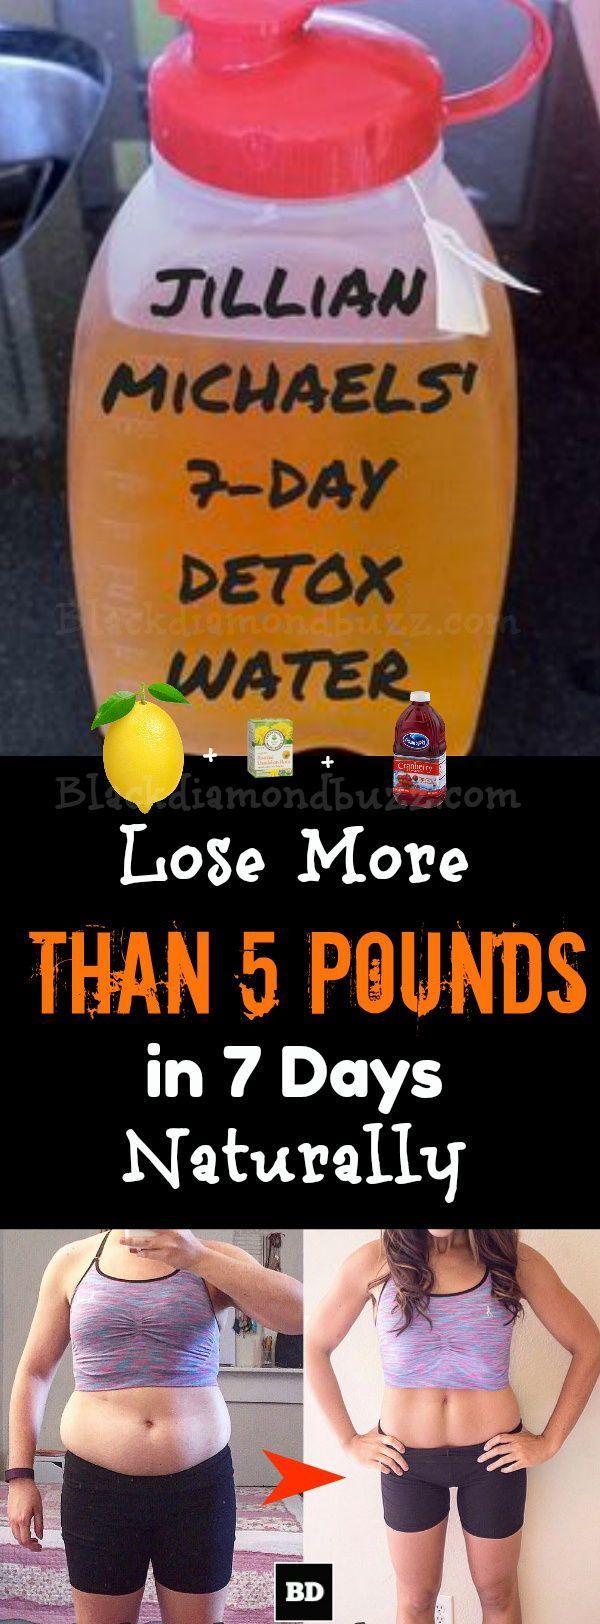 Jillian Michaels Detox Drink Rezepte zur Gewichtsreduktion – New Ideas